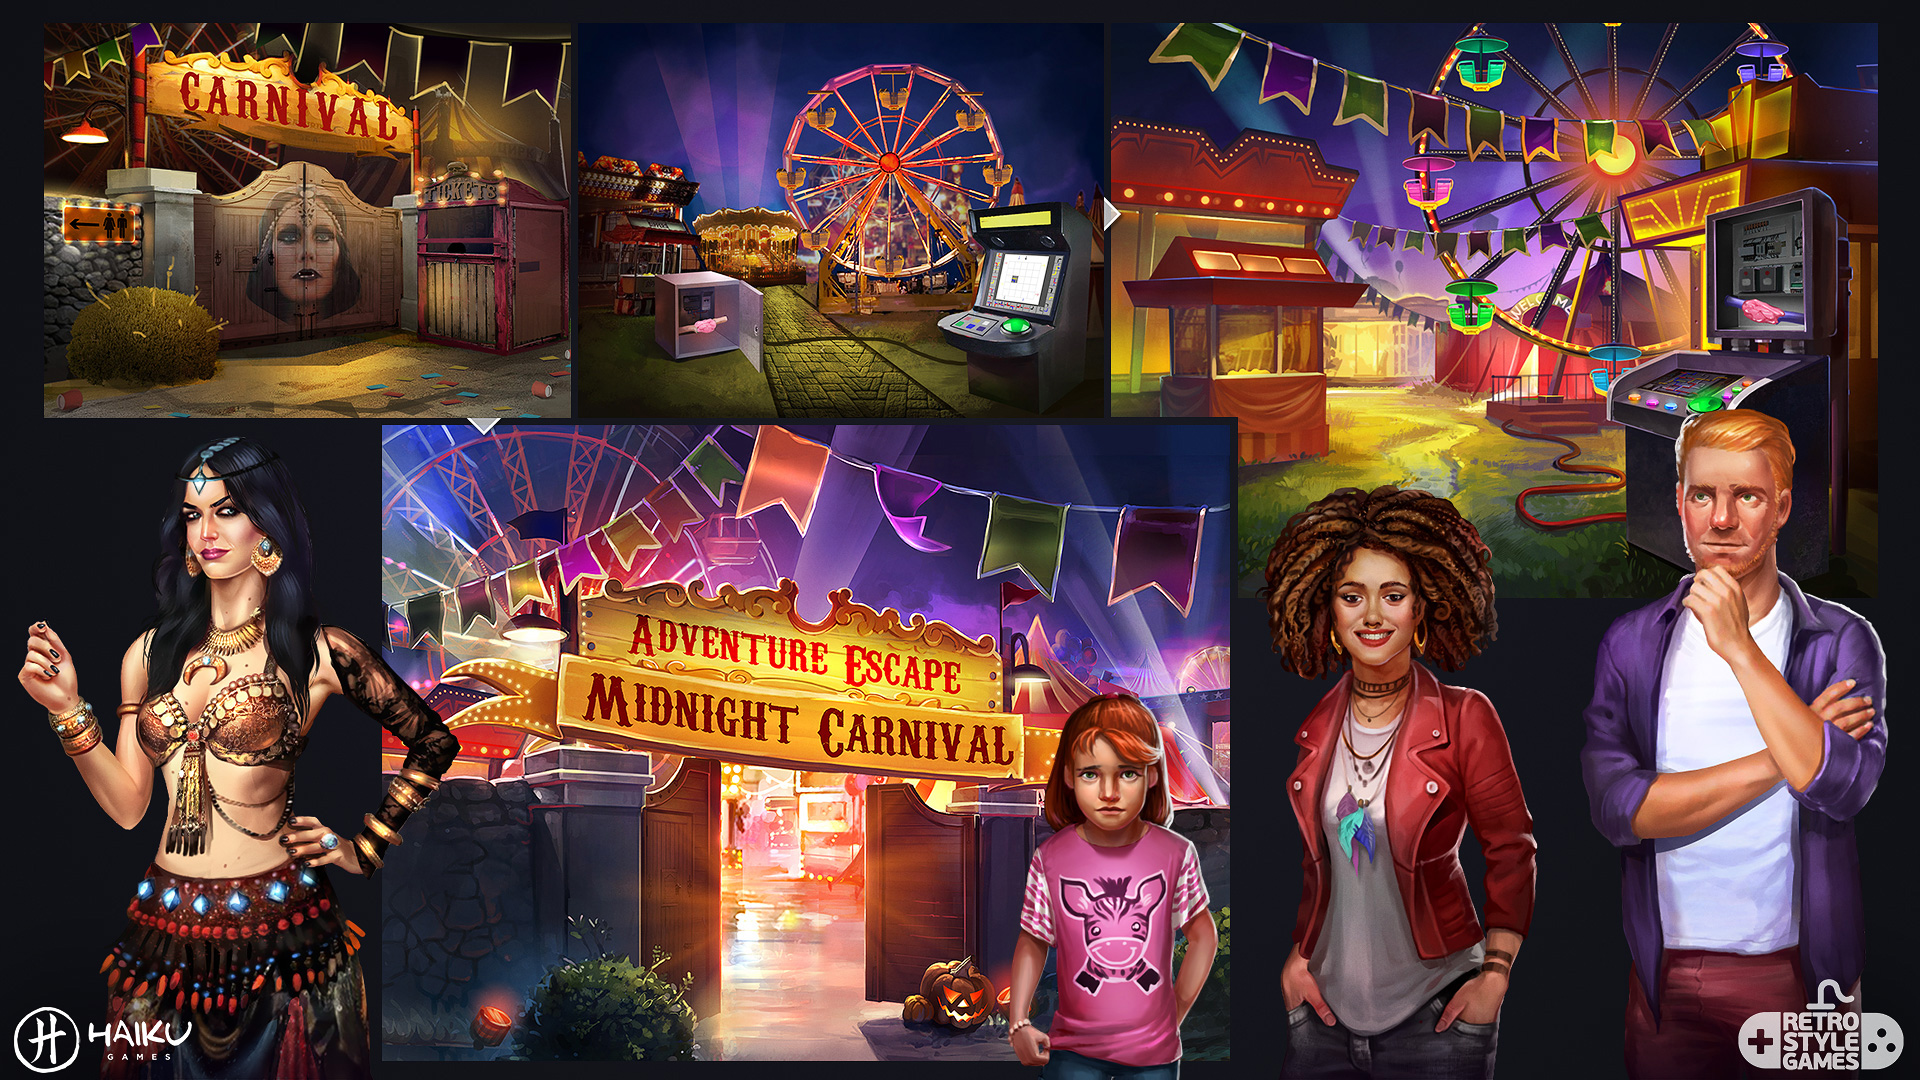 midnight 2d carnival full art sheet3 characters